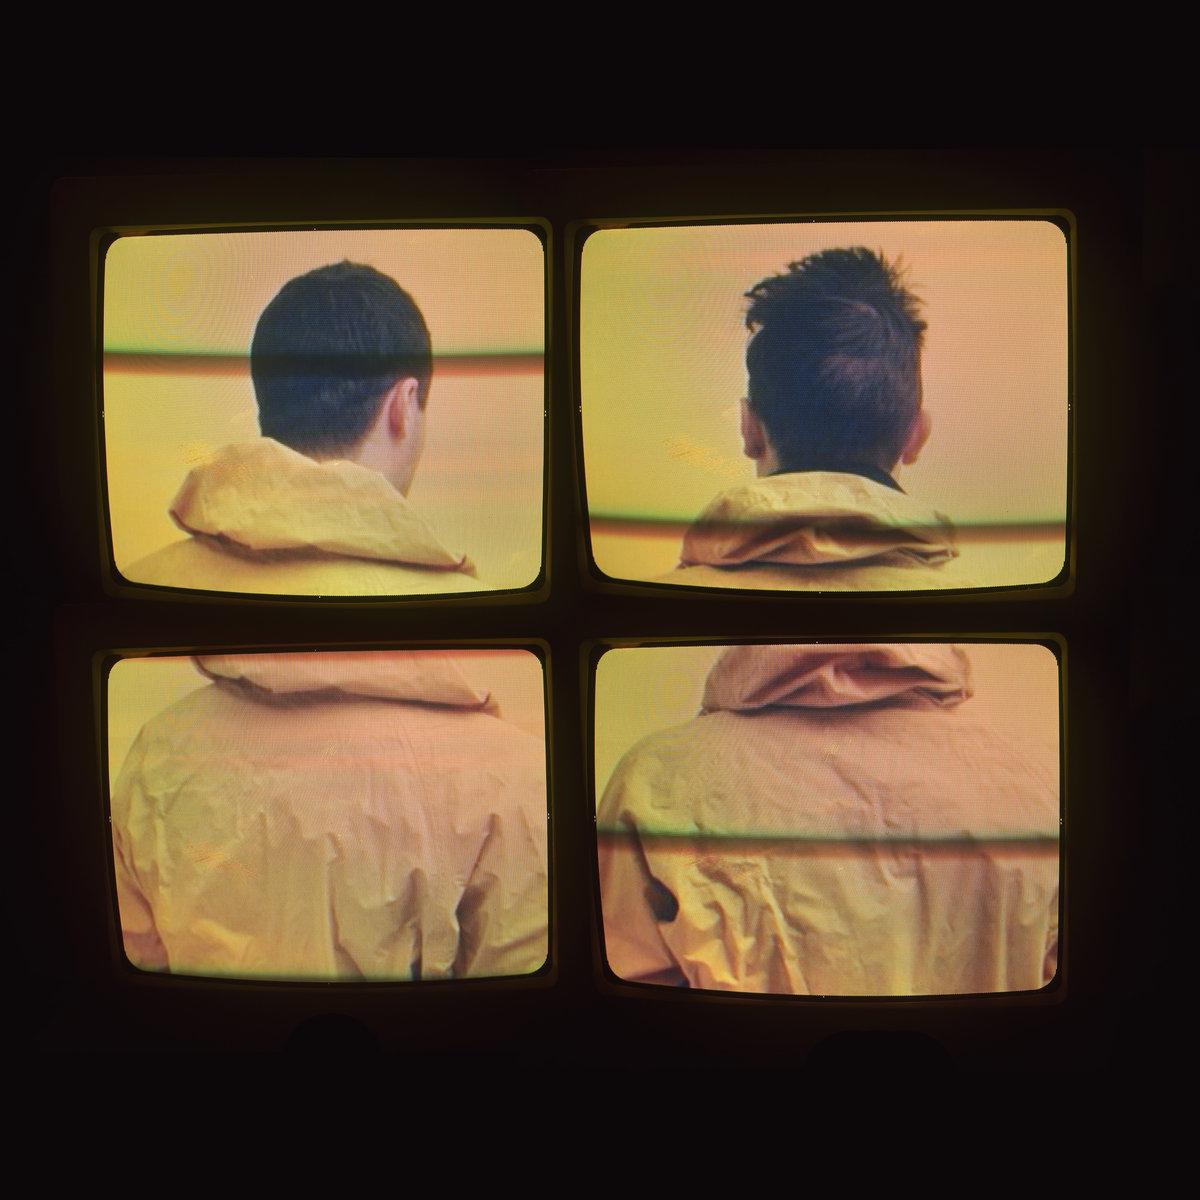 Pleasure-Curses-Screens-EP-Photo